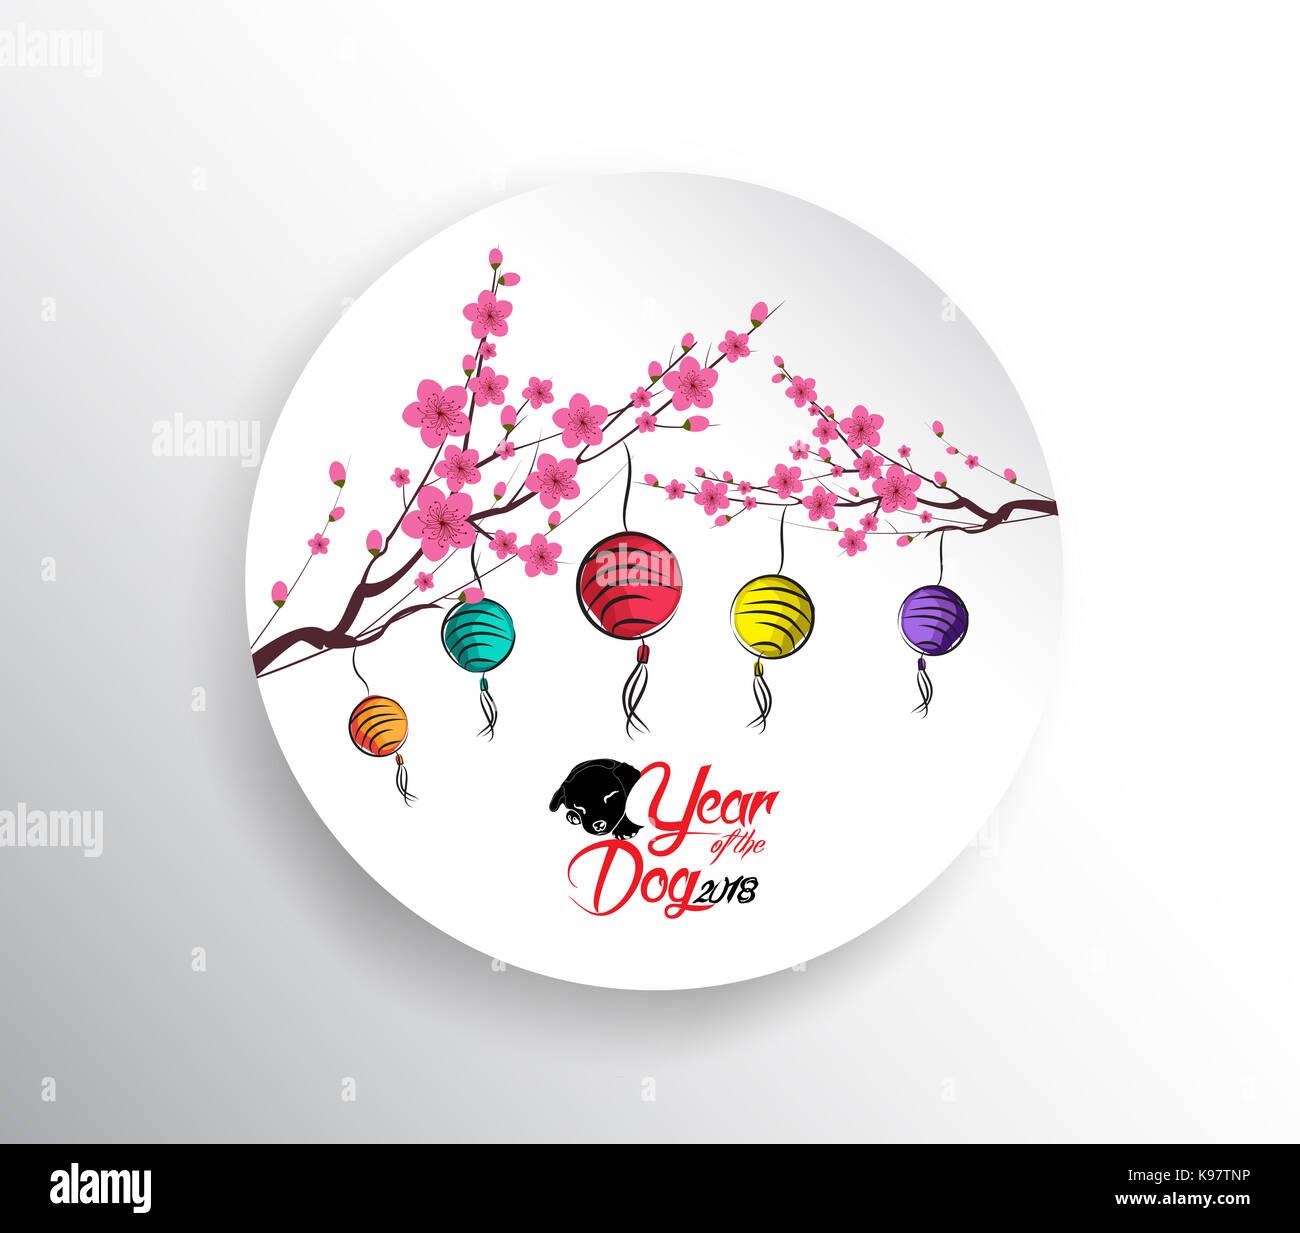 Happy Chinese New Year 2018 Seasons Greetings Lantern Design Year